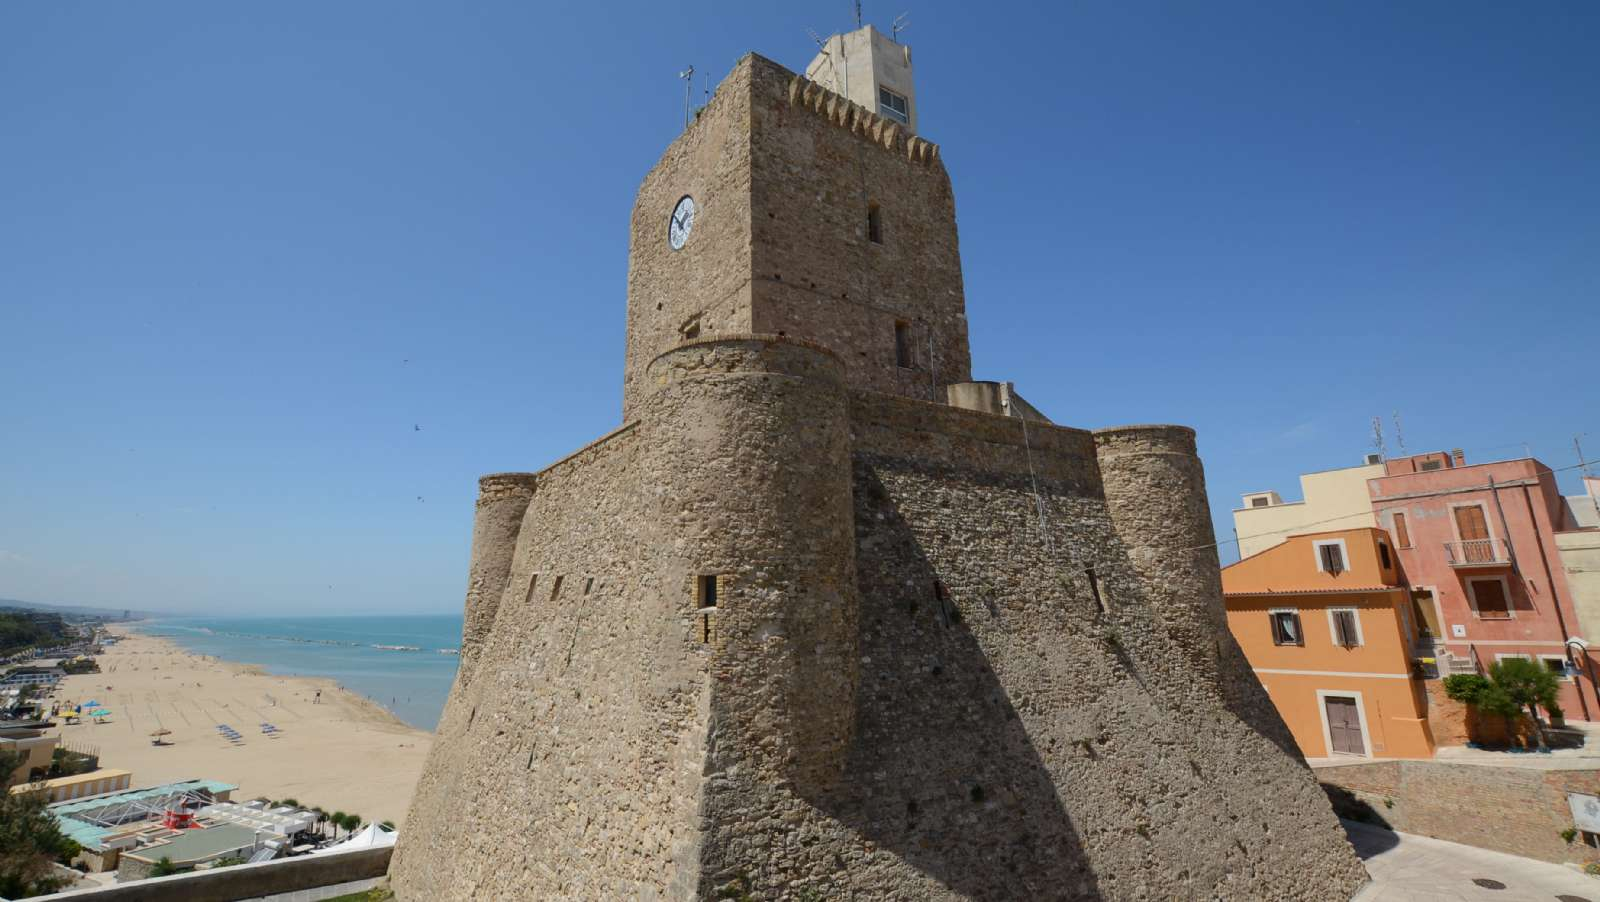 Den uindtagelige borg Castello Svevo